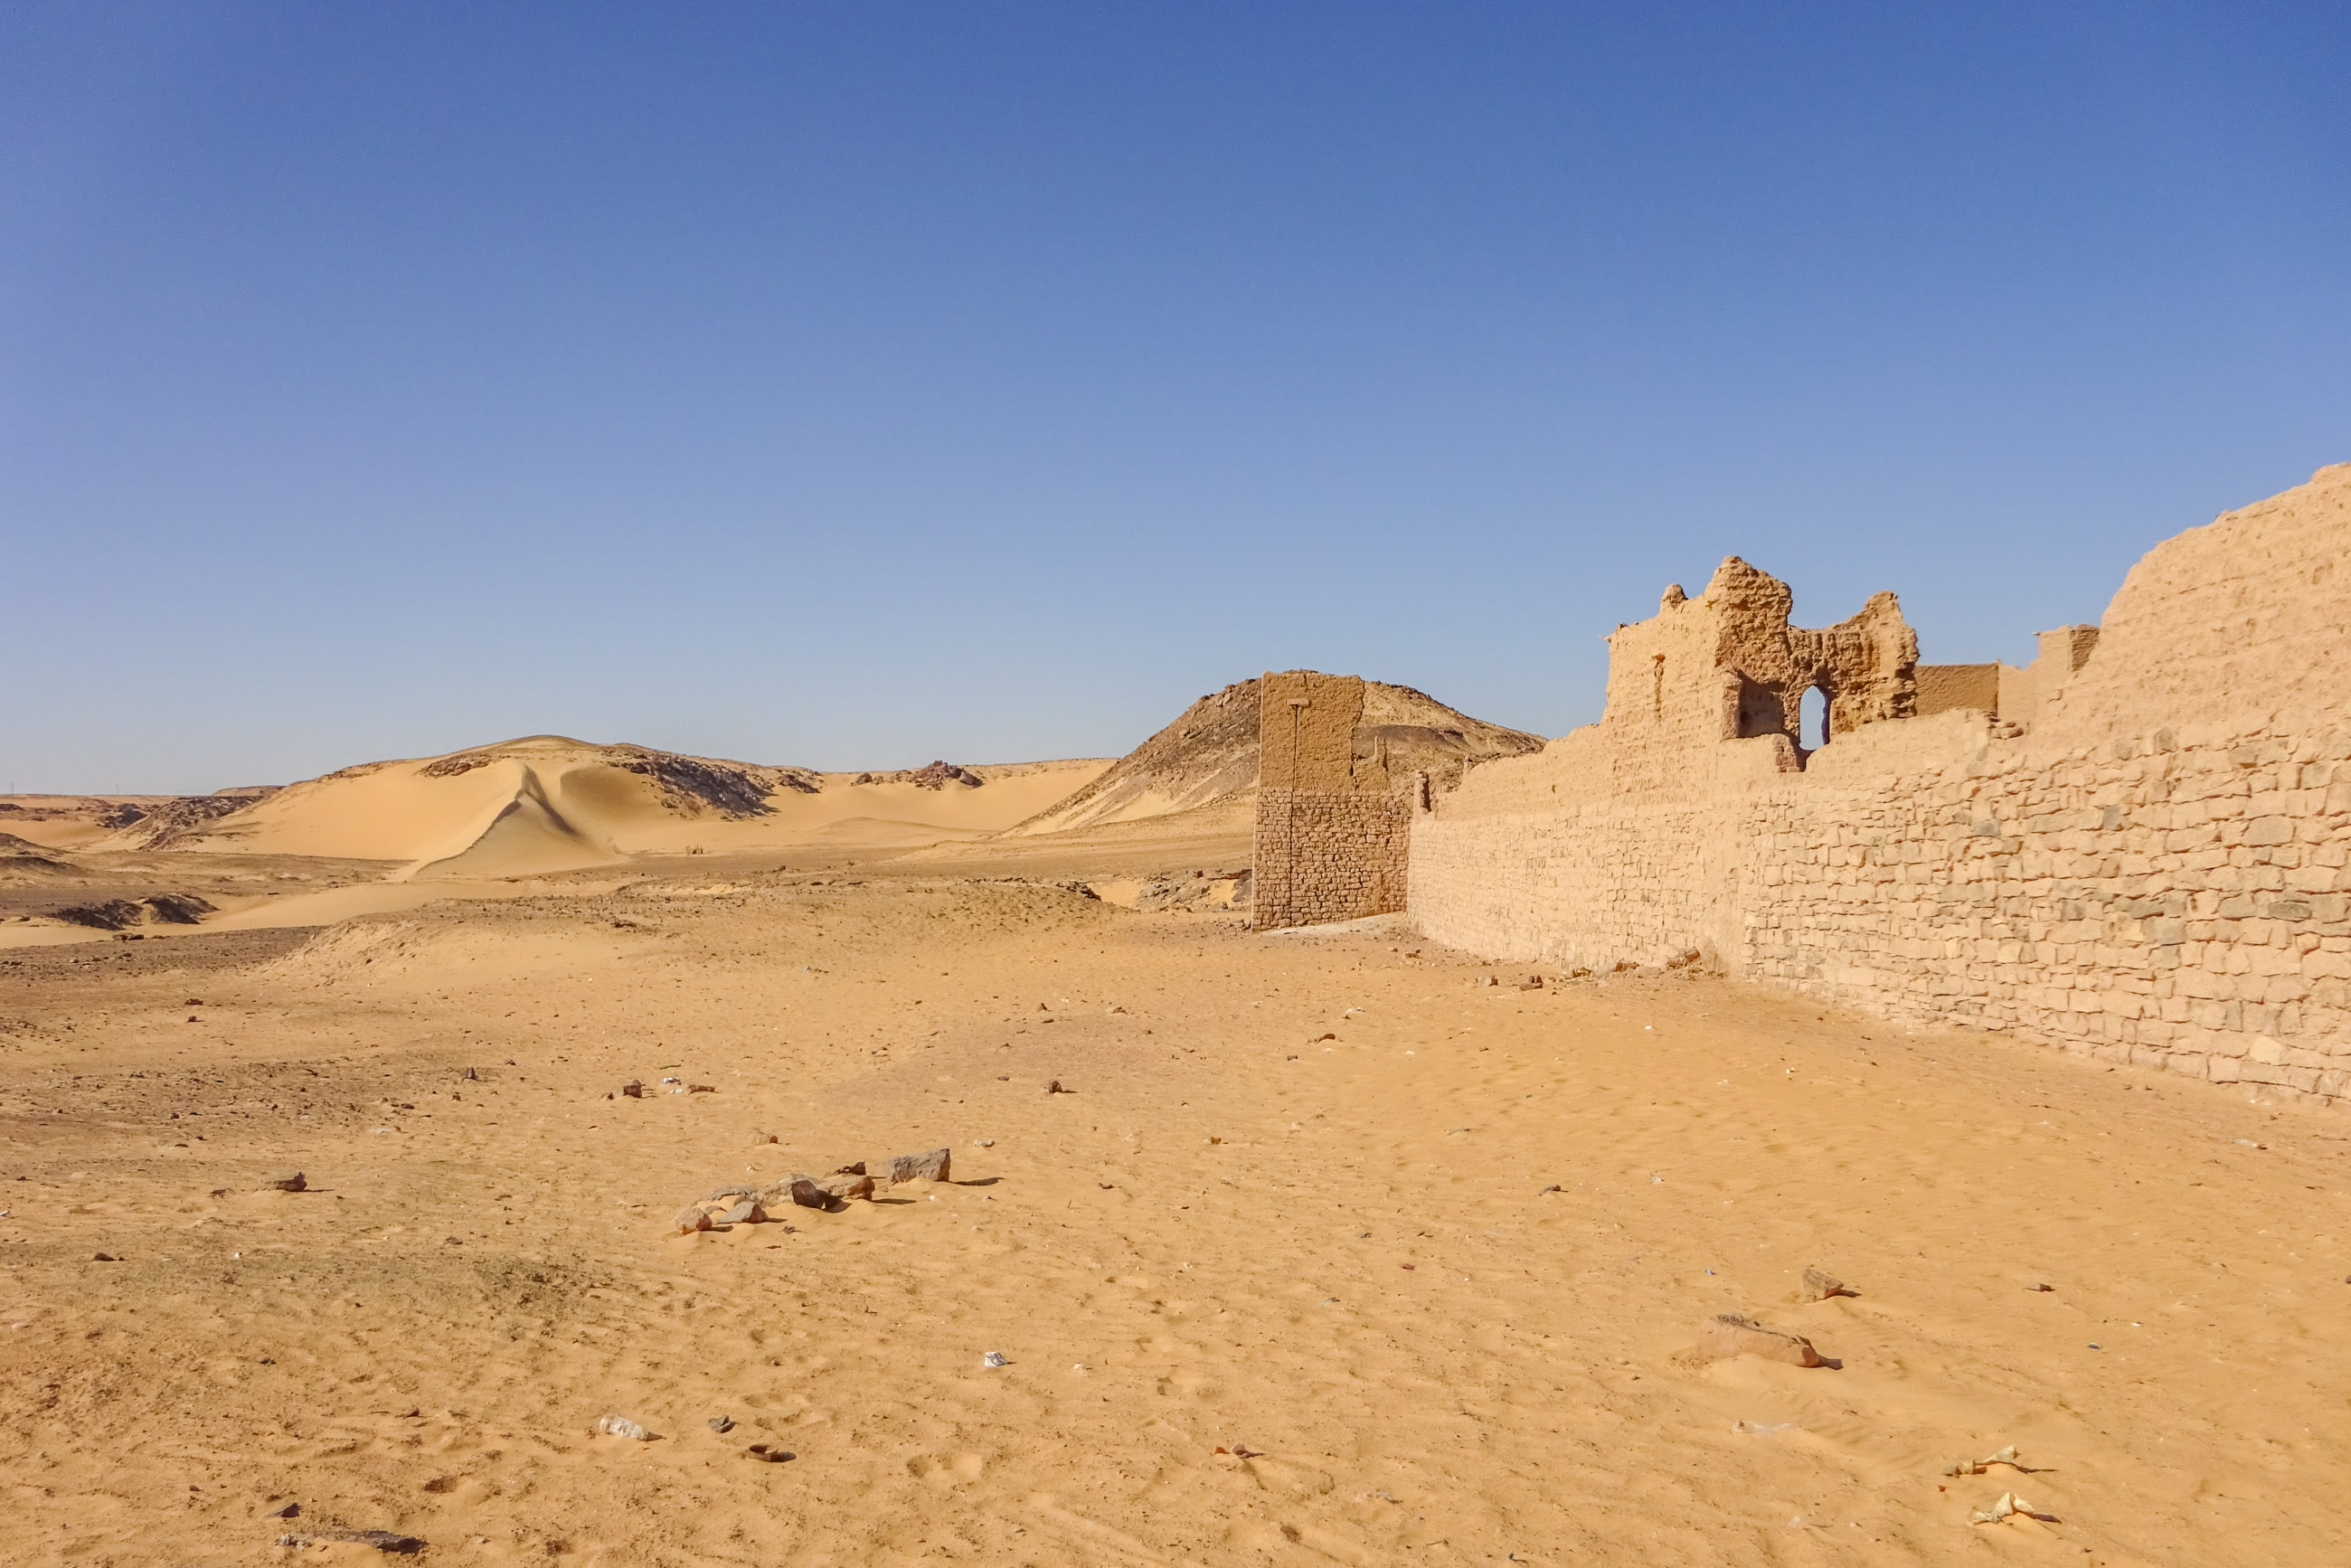 https://bubo.sk/uploads/galleries/17820/miroslavadlha_egypt_aswan-49-.jpg